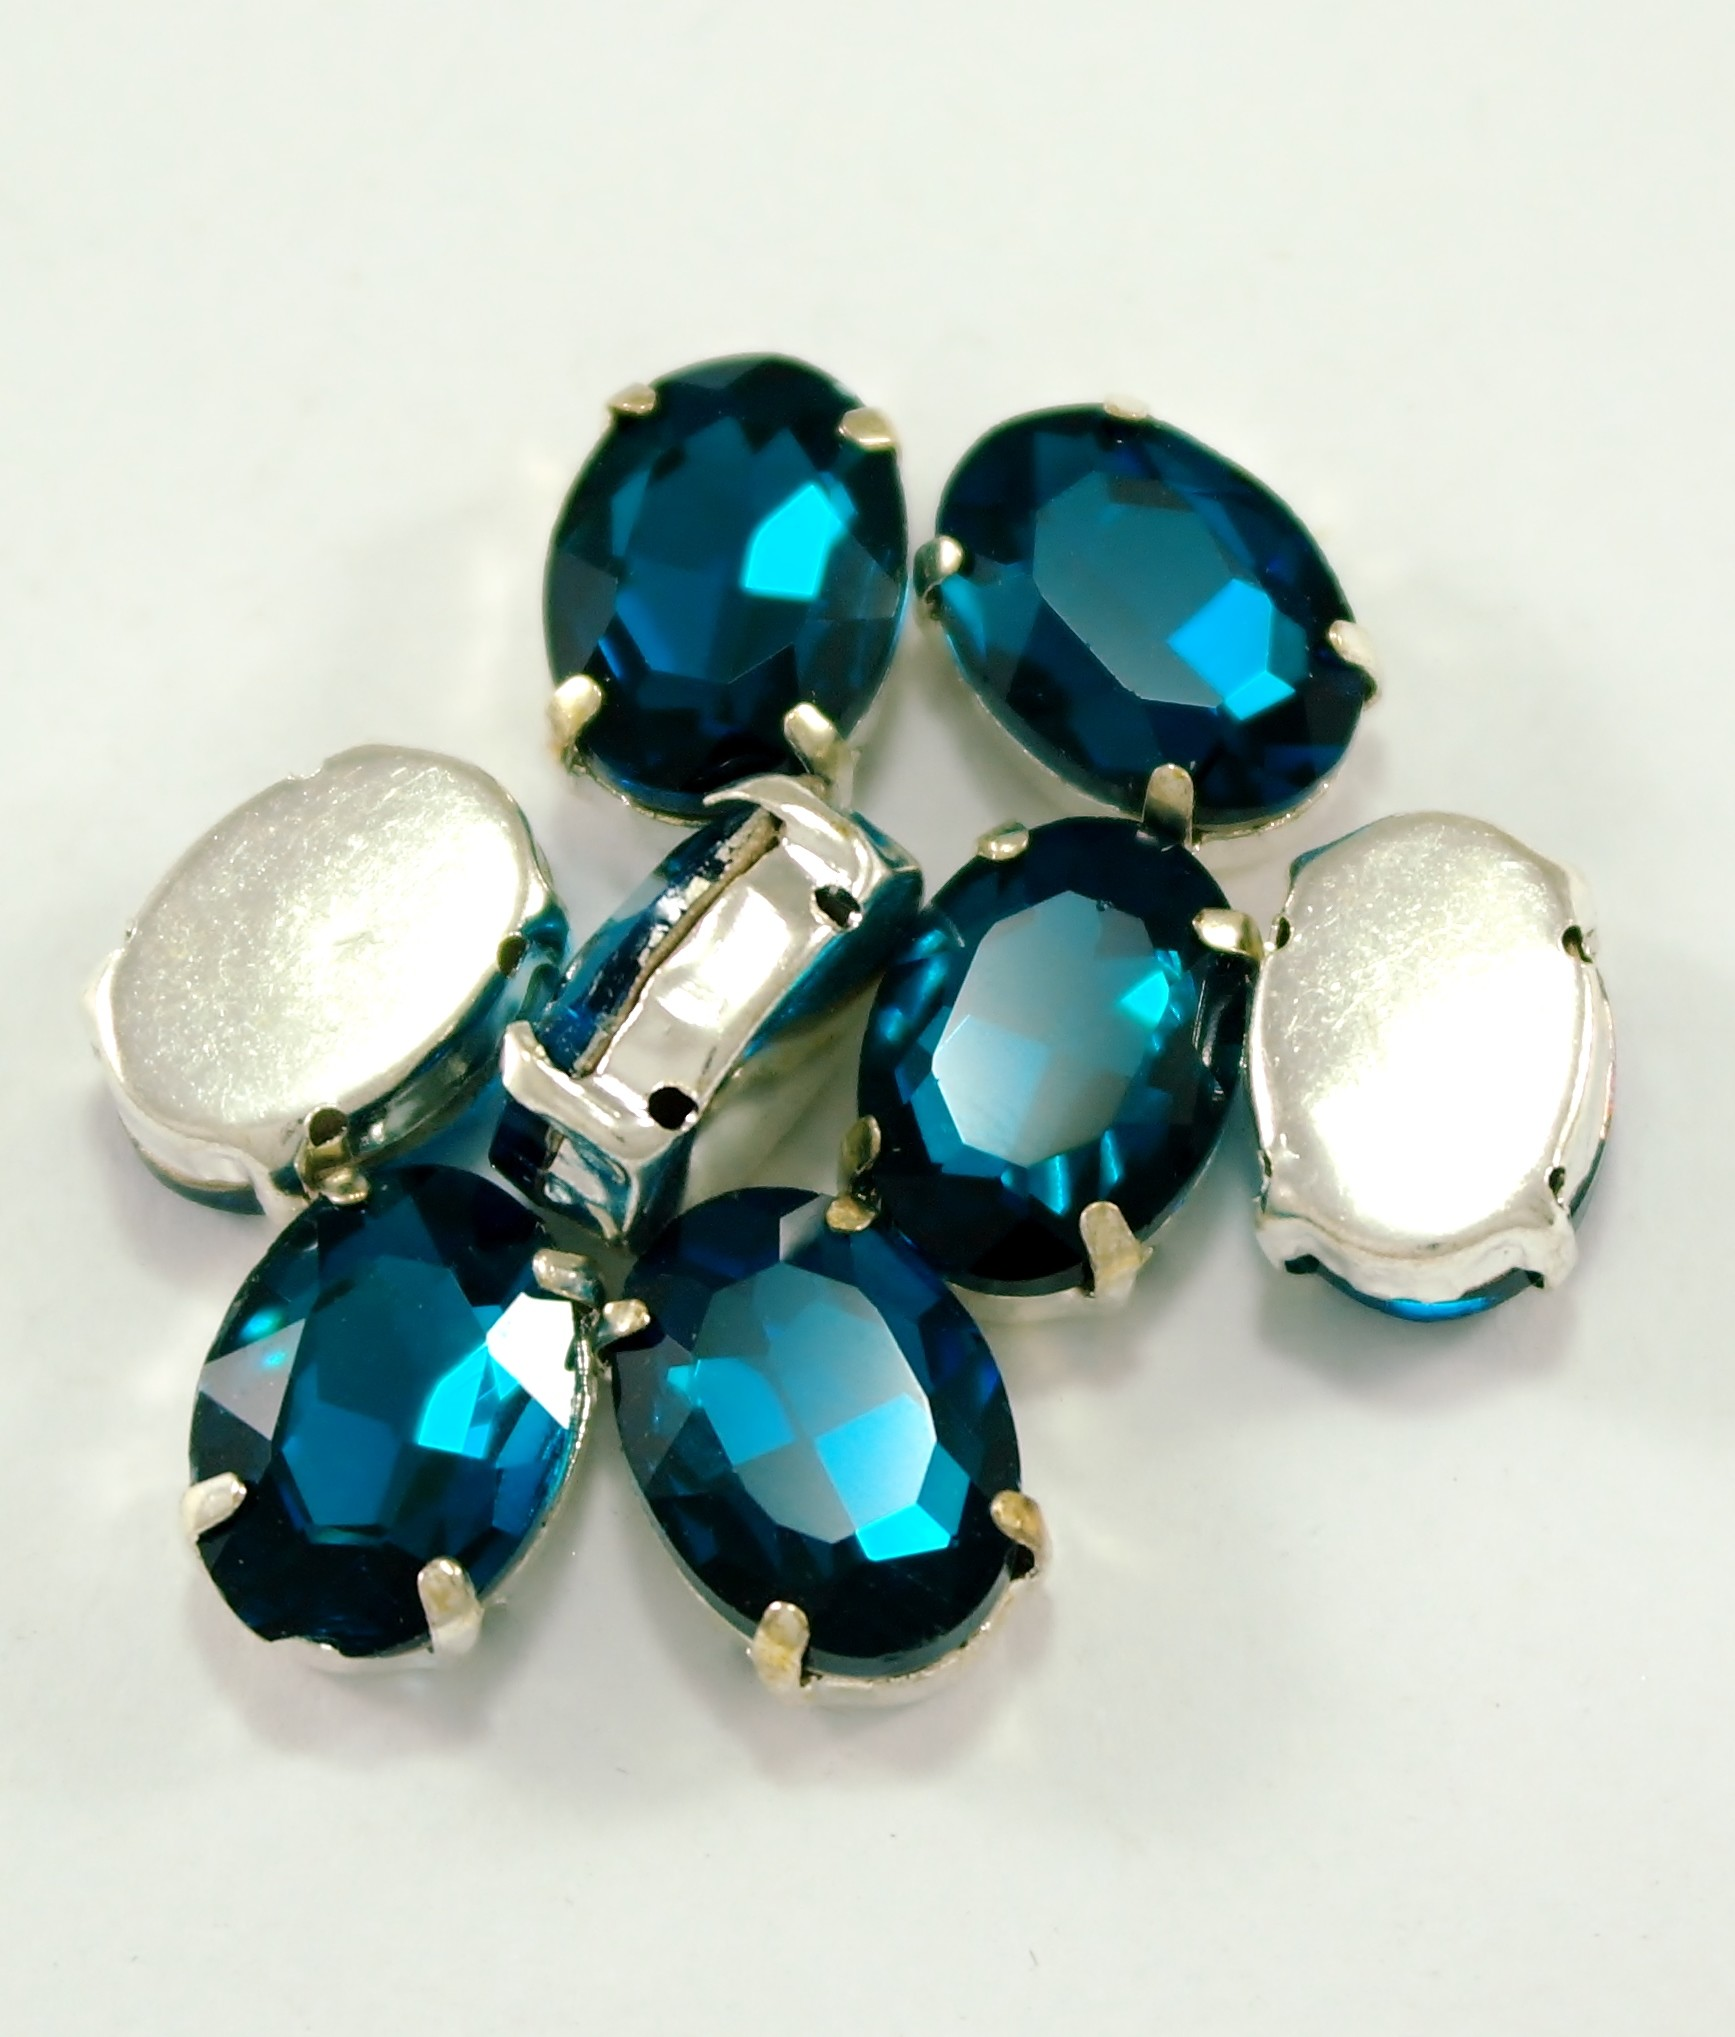 GLASS BEADS - BLUE ZIRCOIN OVAL (O5)